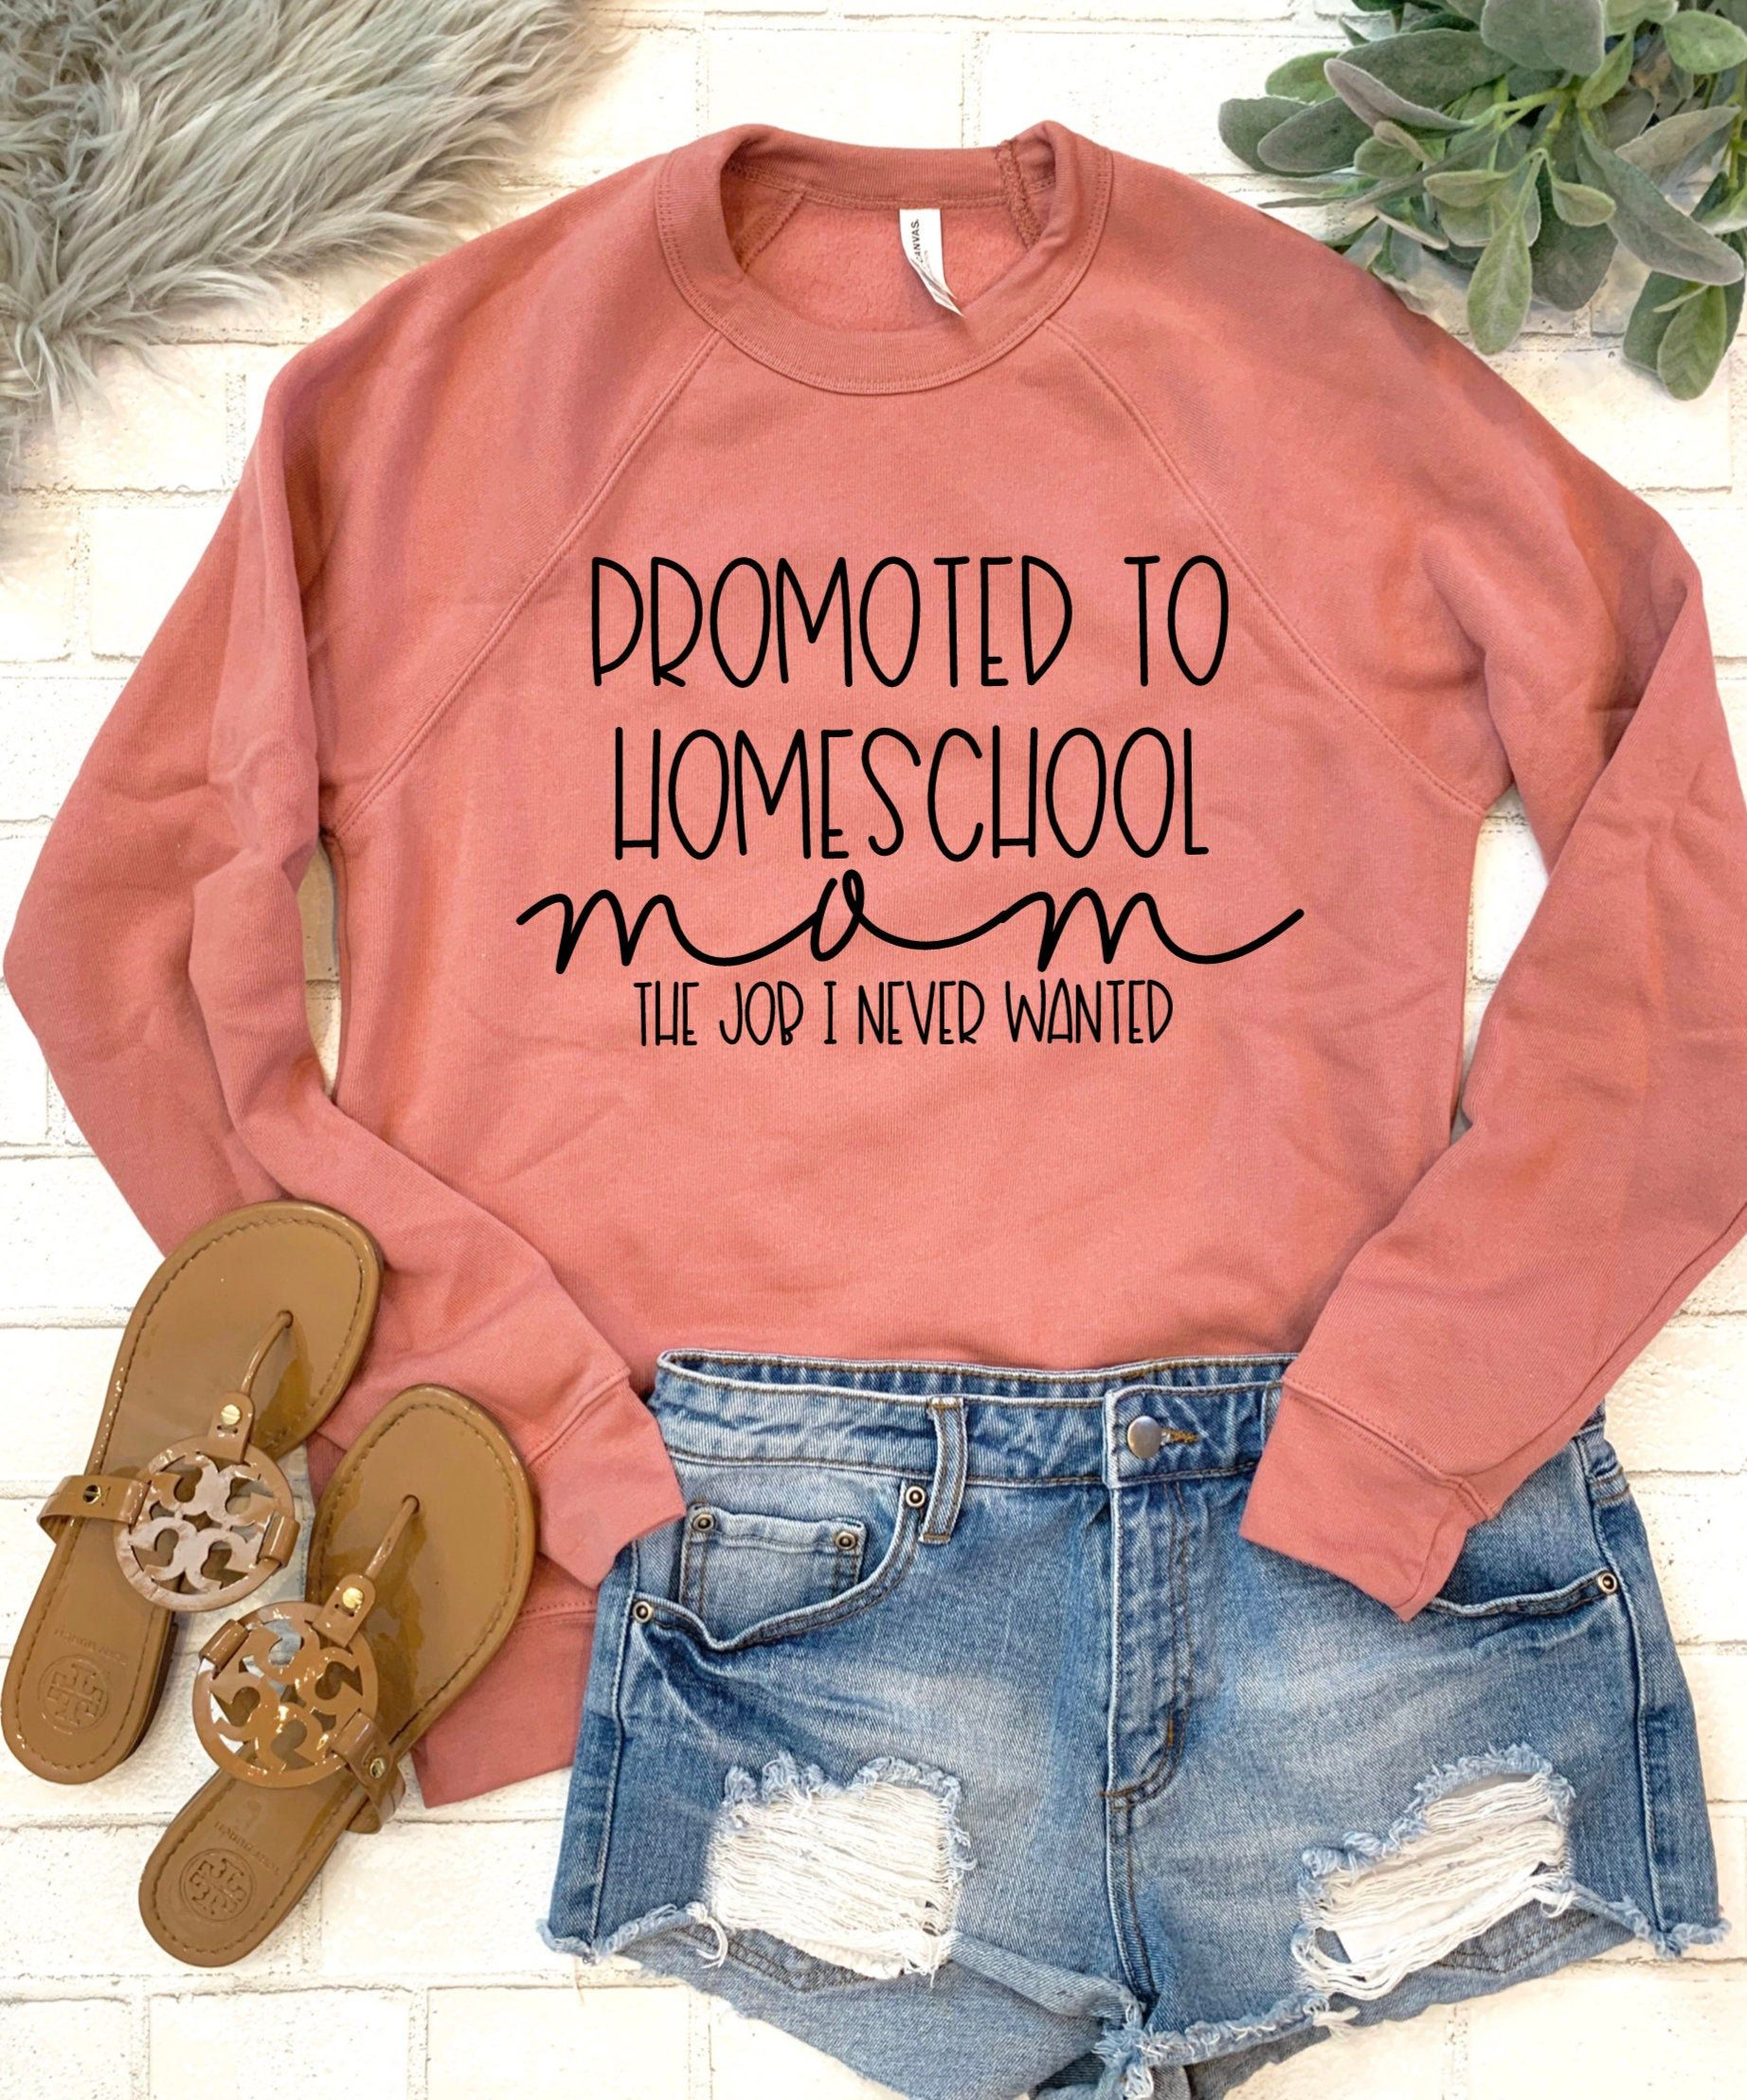 Homeschool Mom Shirt Inspirational Shirts for Teachers